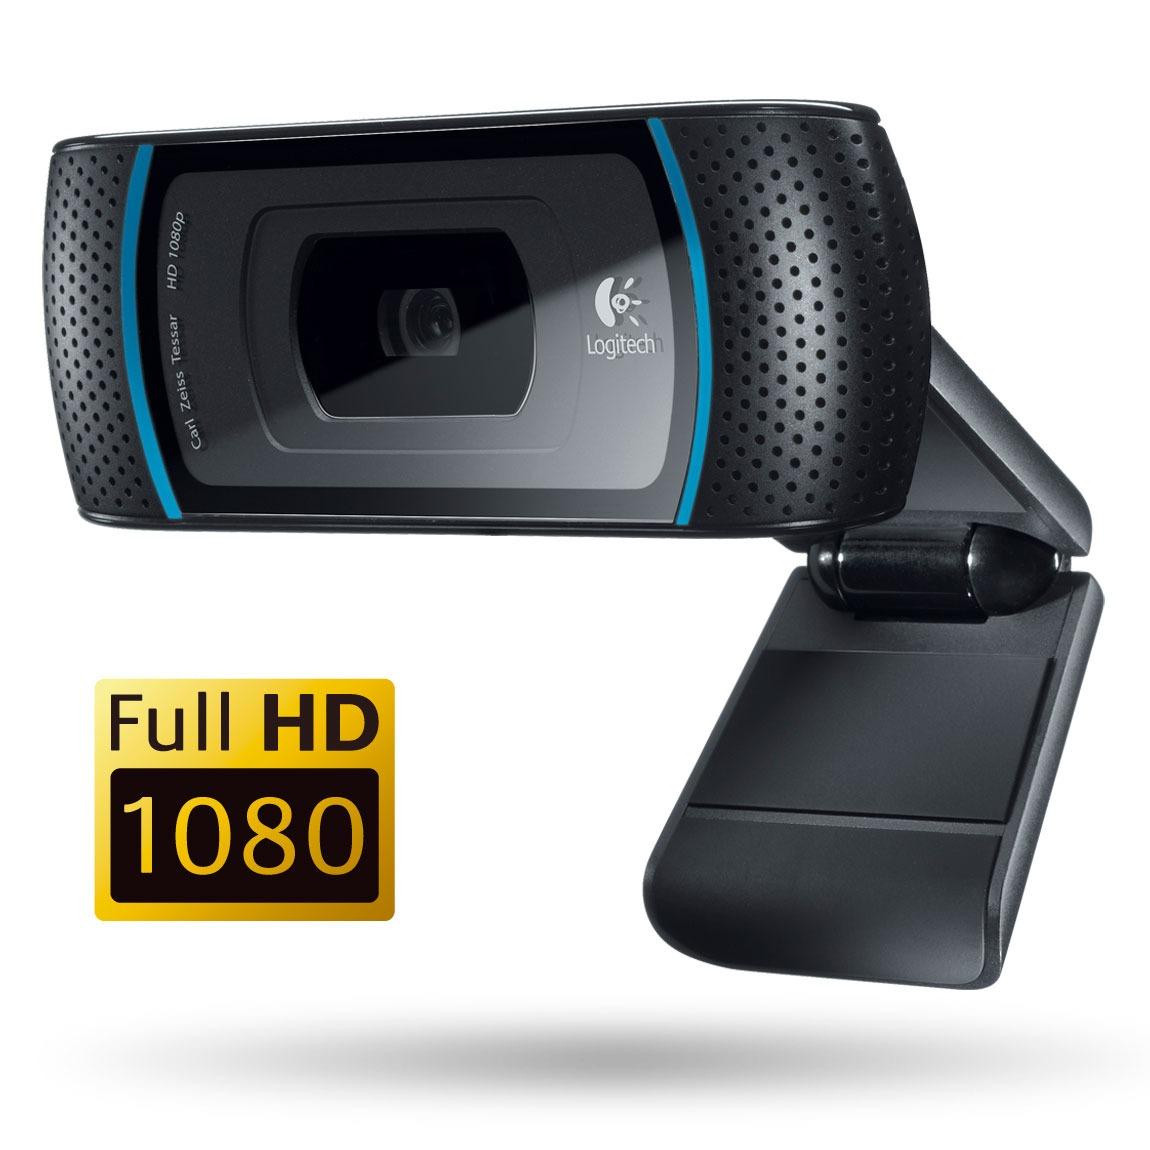 Webcam Logitech HD Pro Webcam C910 Logitech HD Pro Webcam C910